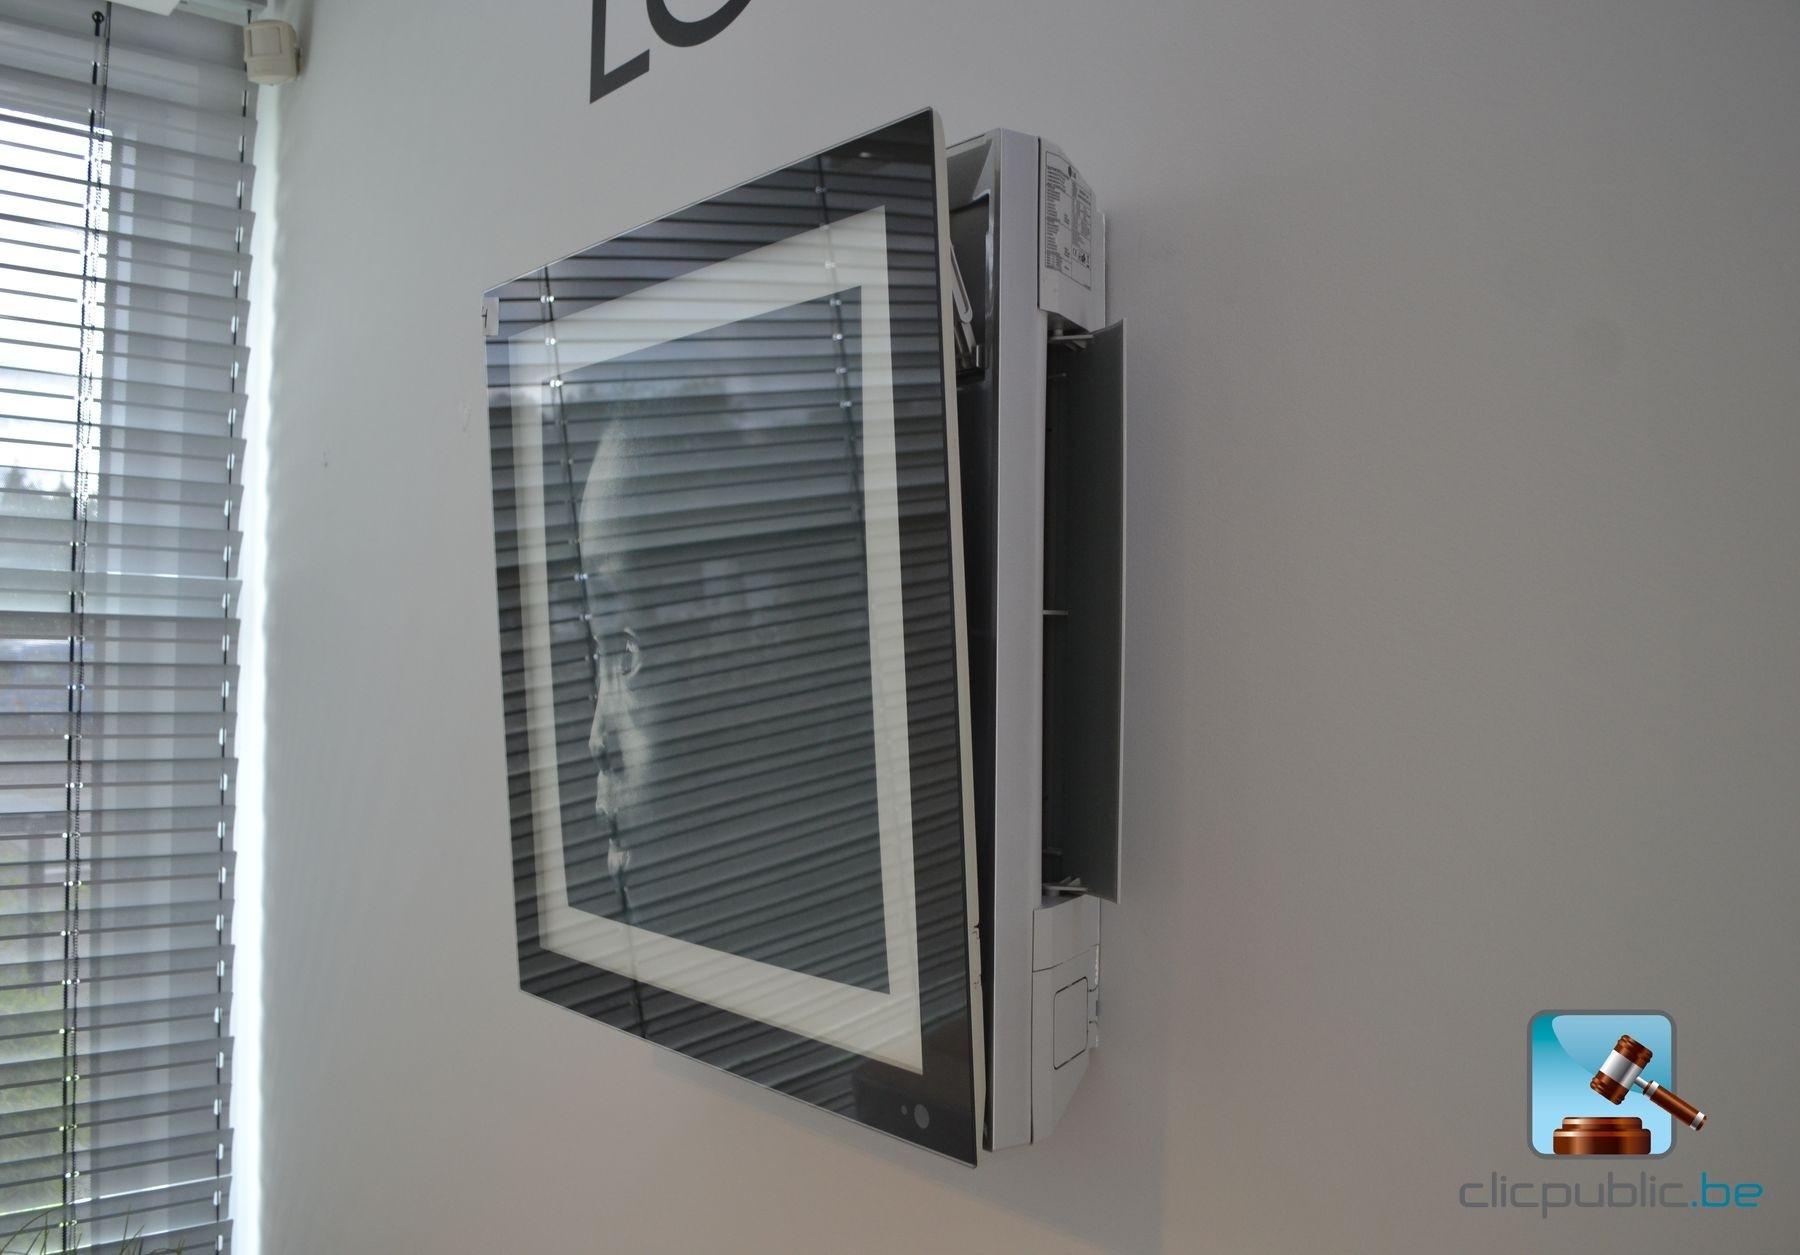 Radiateur schema chauffage air conditionne mural for Climatiseur mural ne refroidit plus